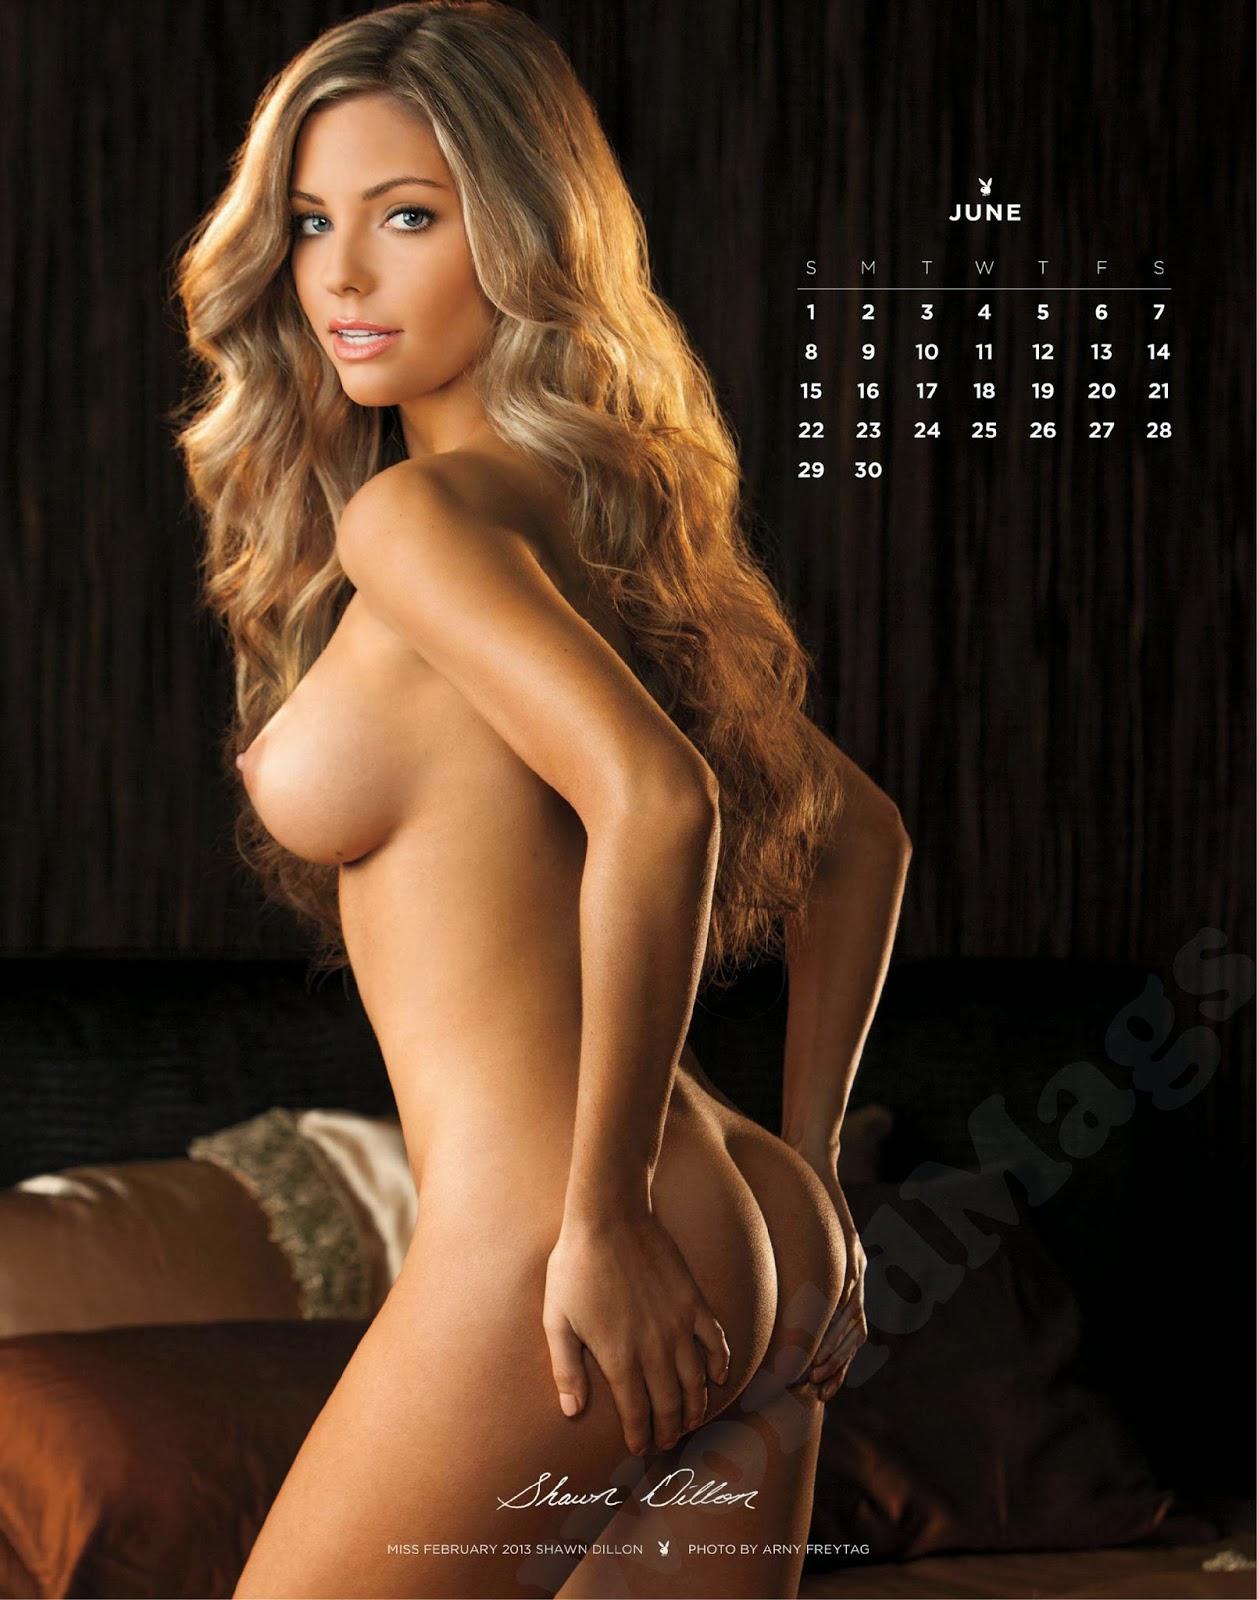 xxx-nude-calendars-wives-hole-amateur